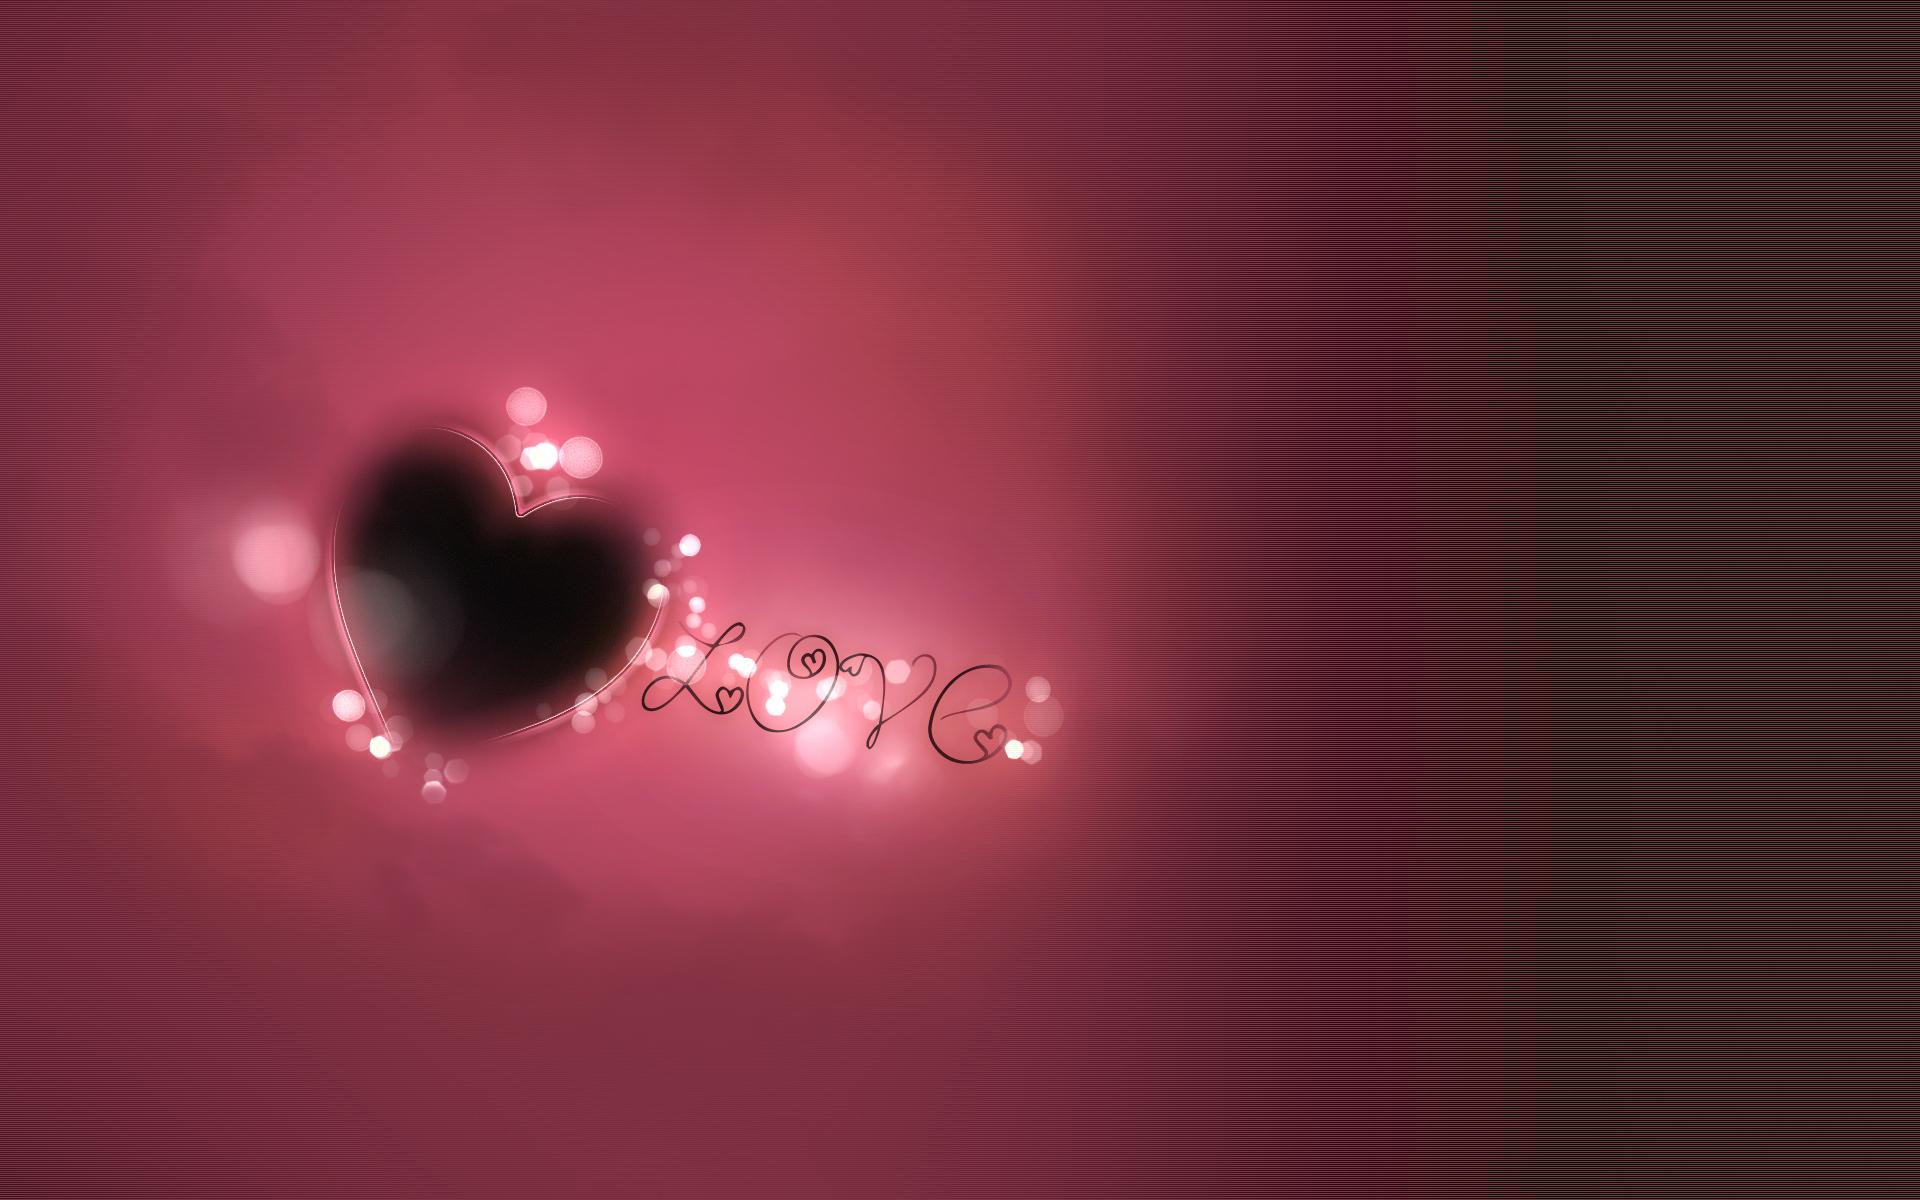 Wallpaper Valentine S Day Heart 1920x1200